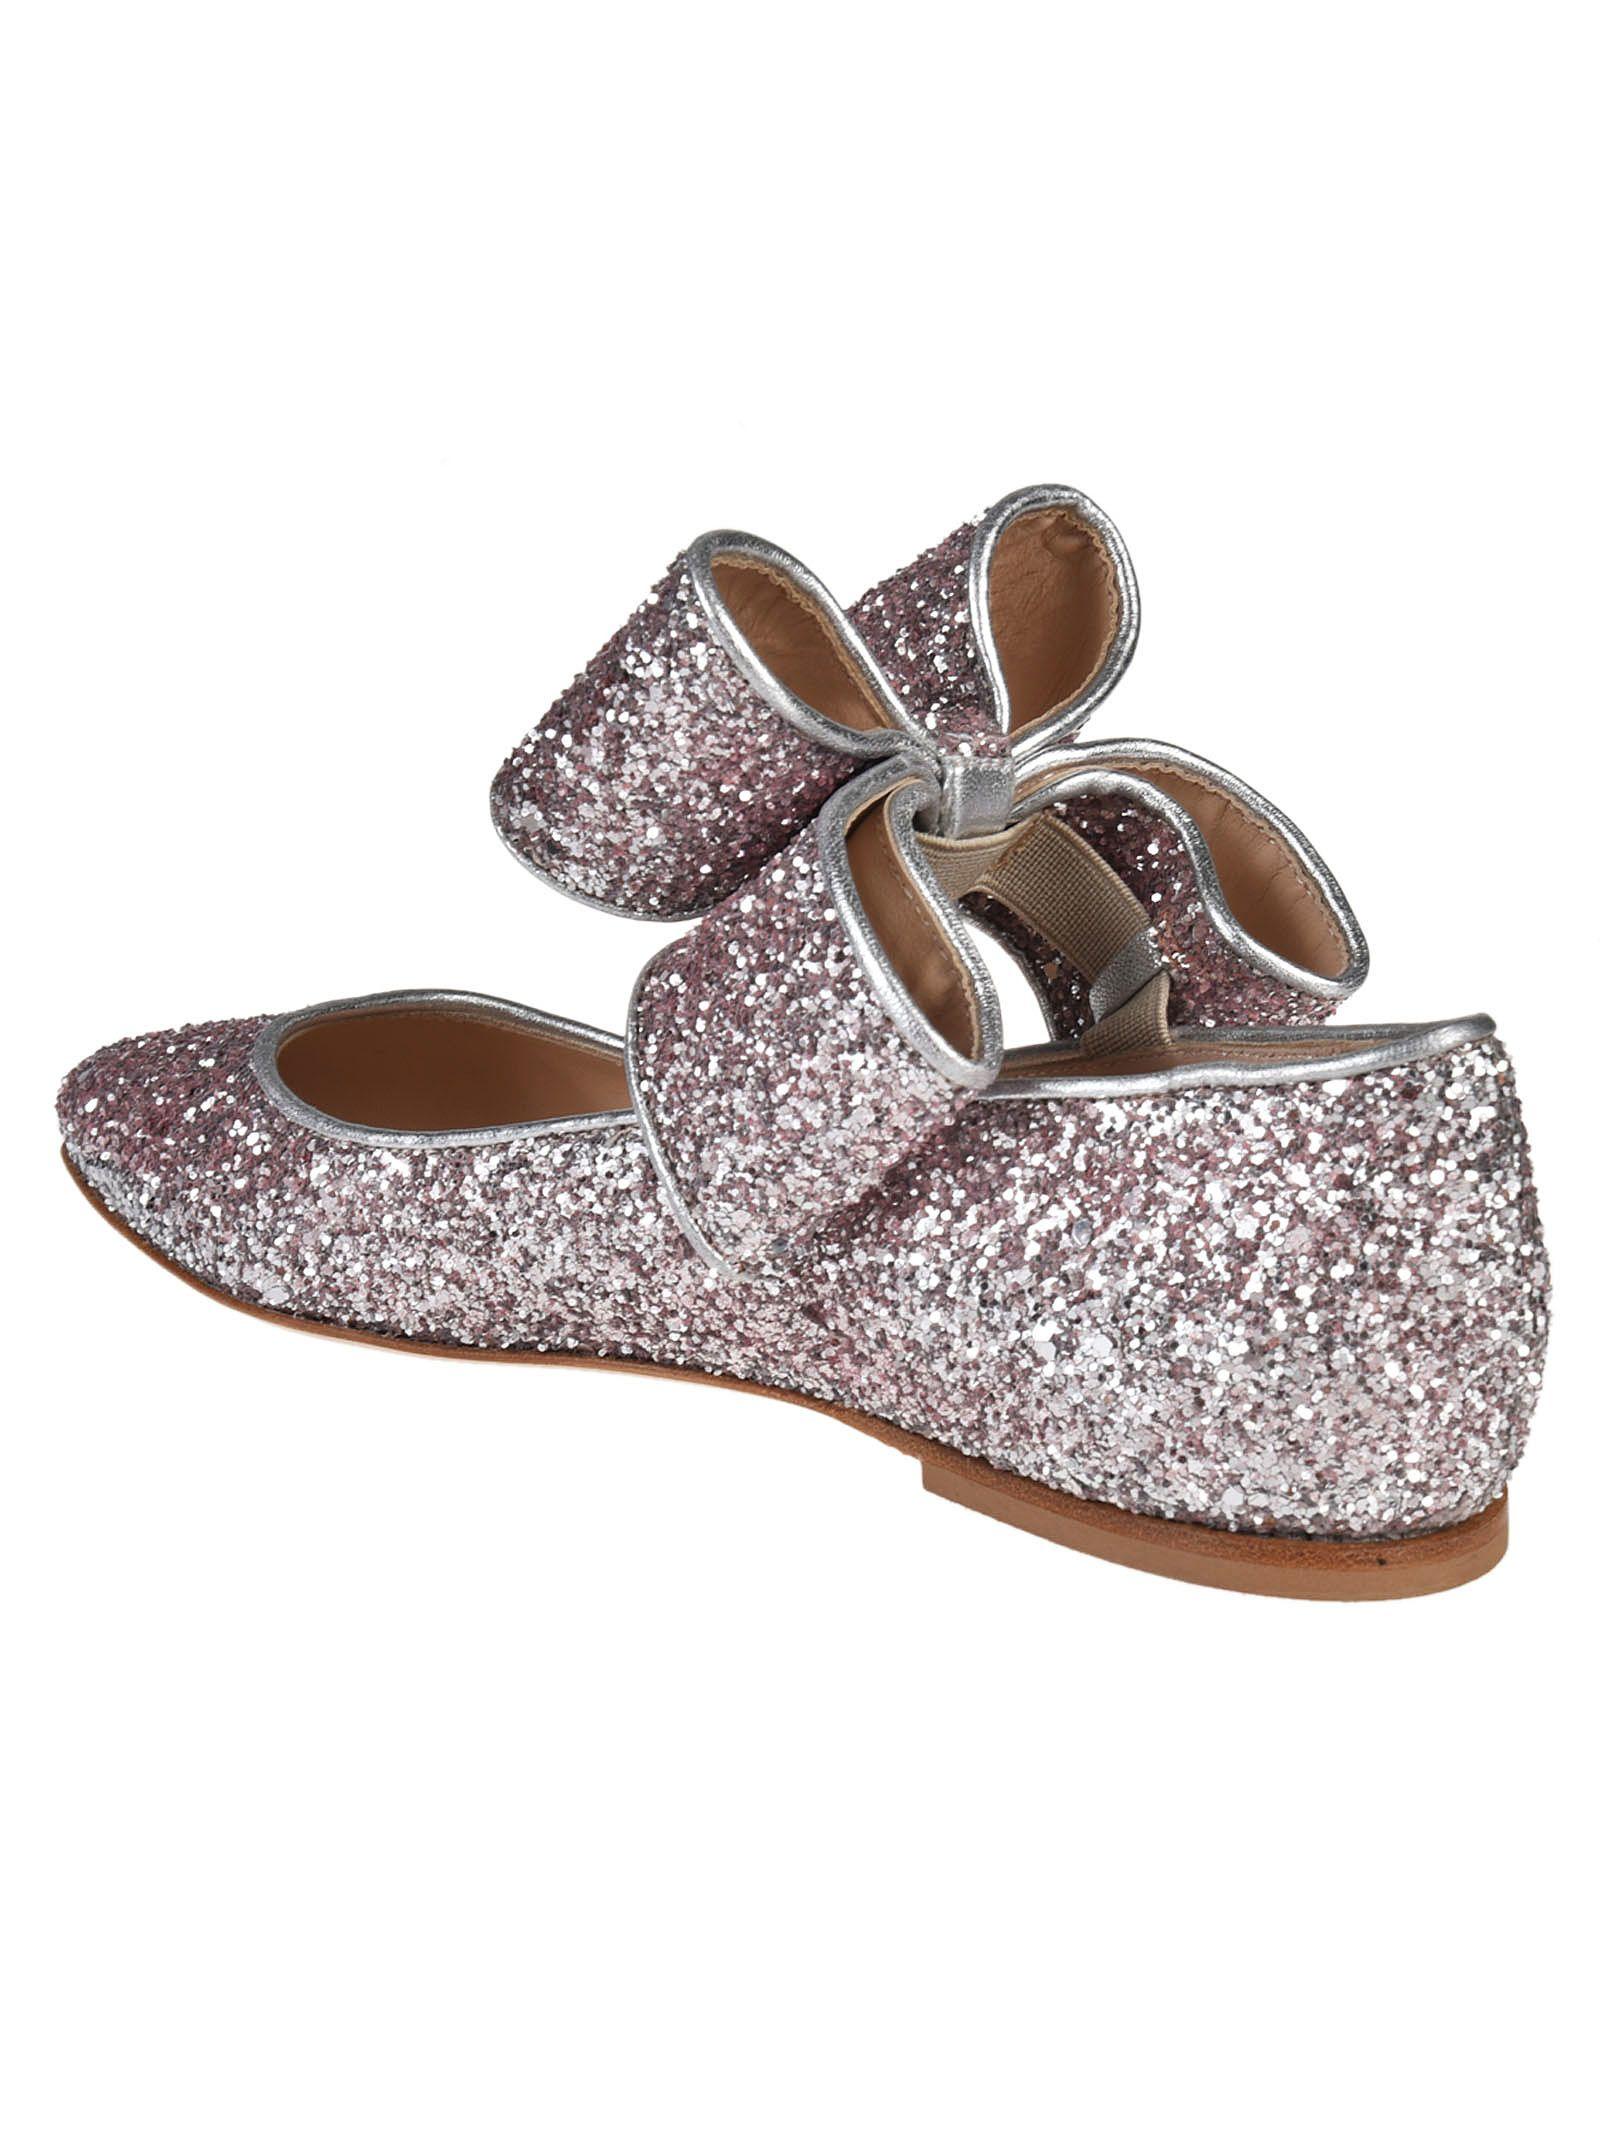 Polly Plume Glitter bow sandals 0Xmqu